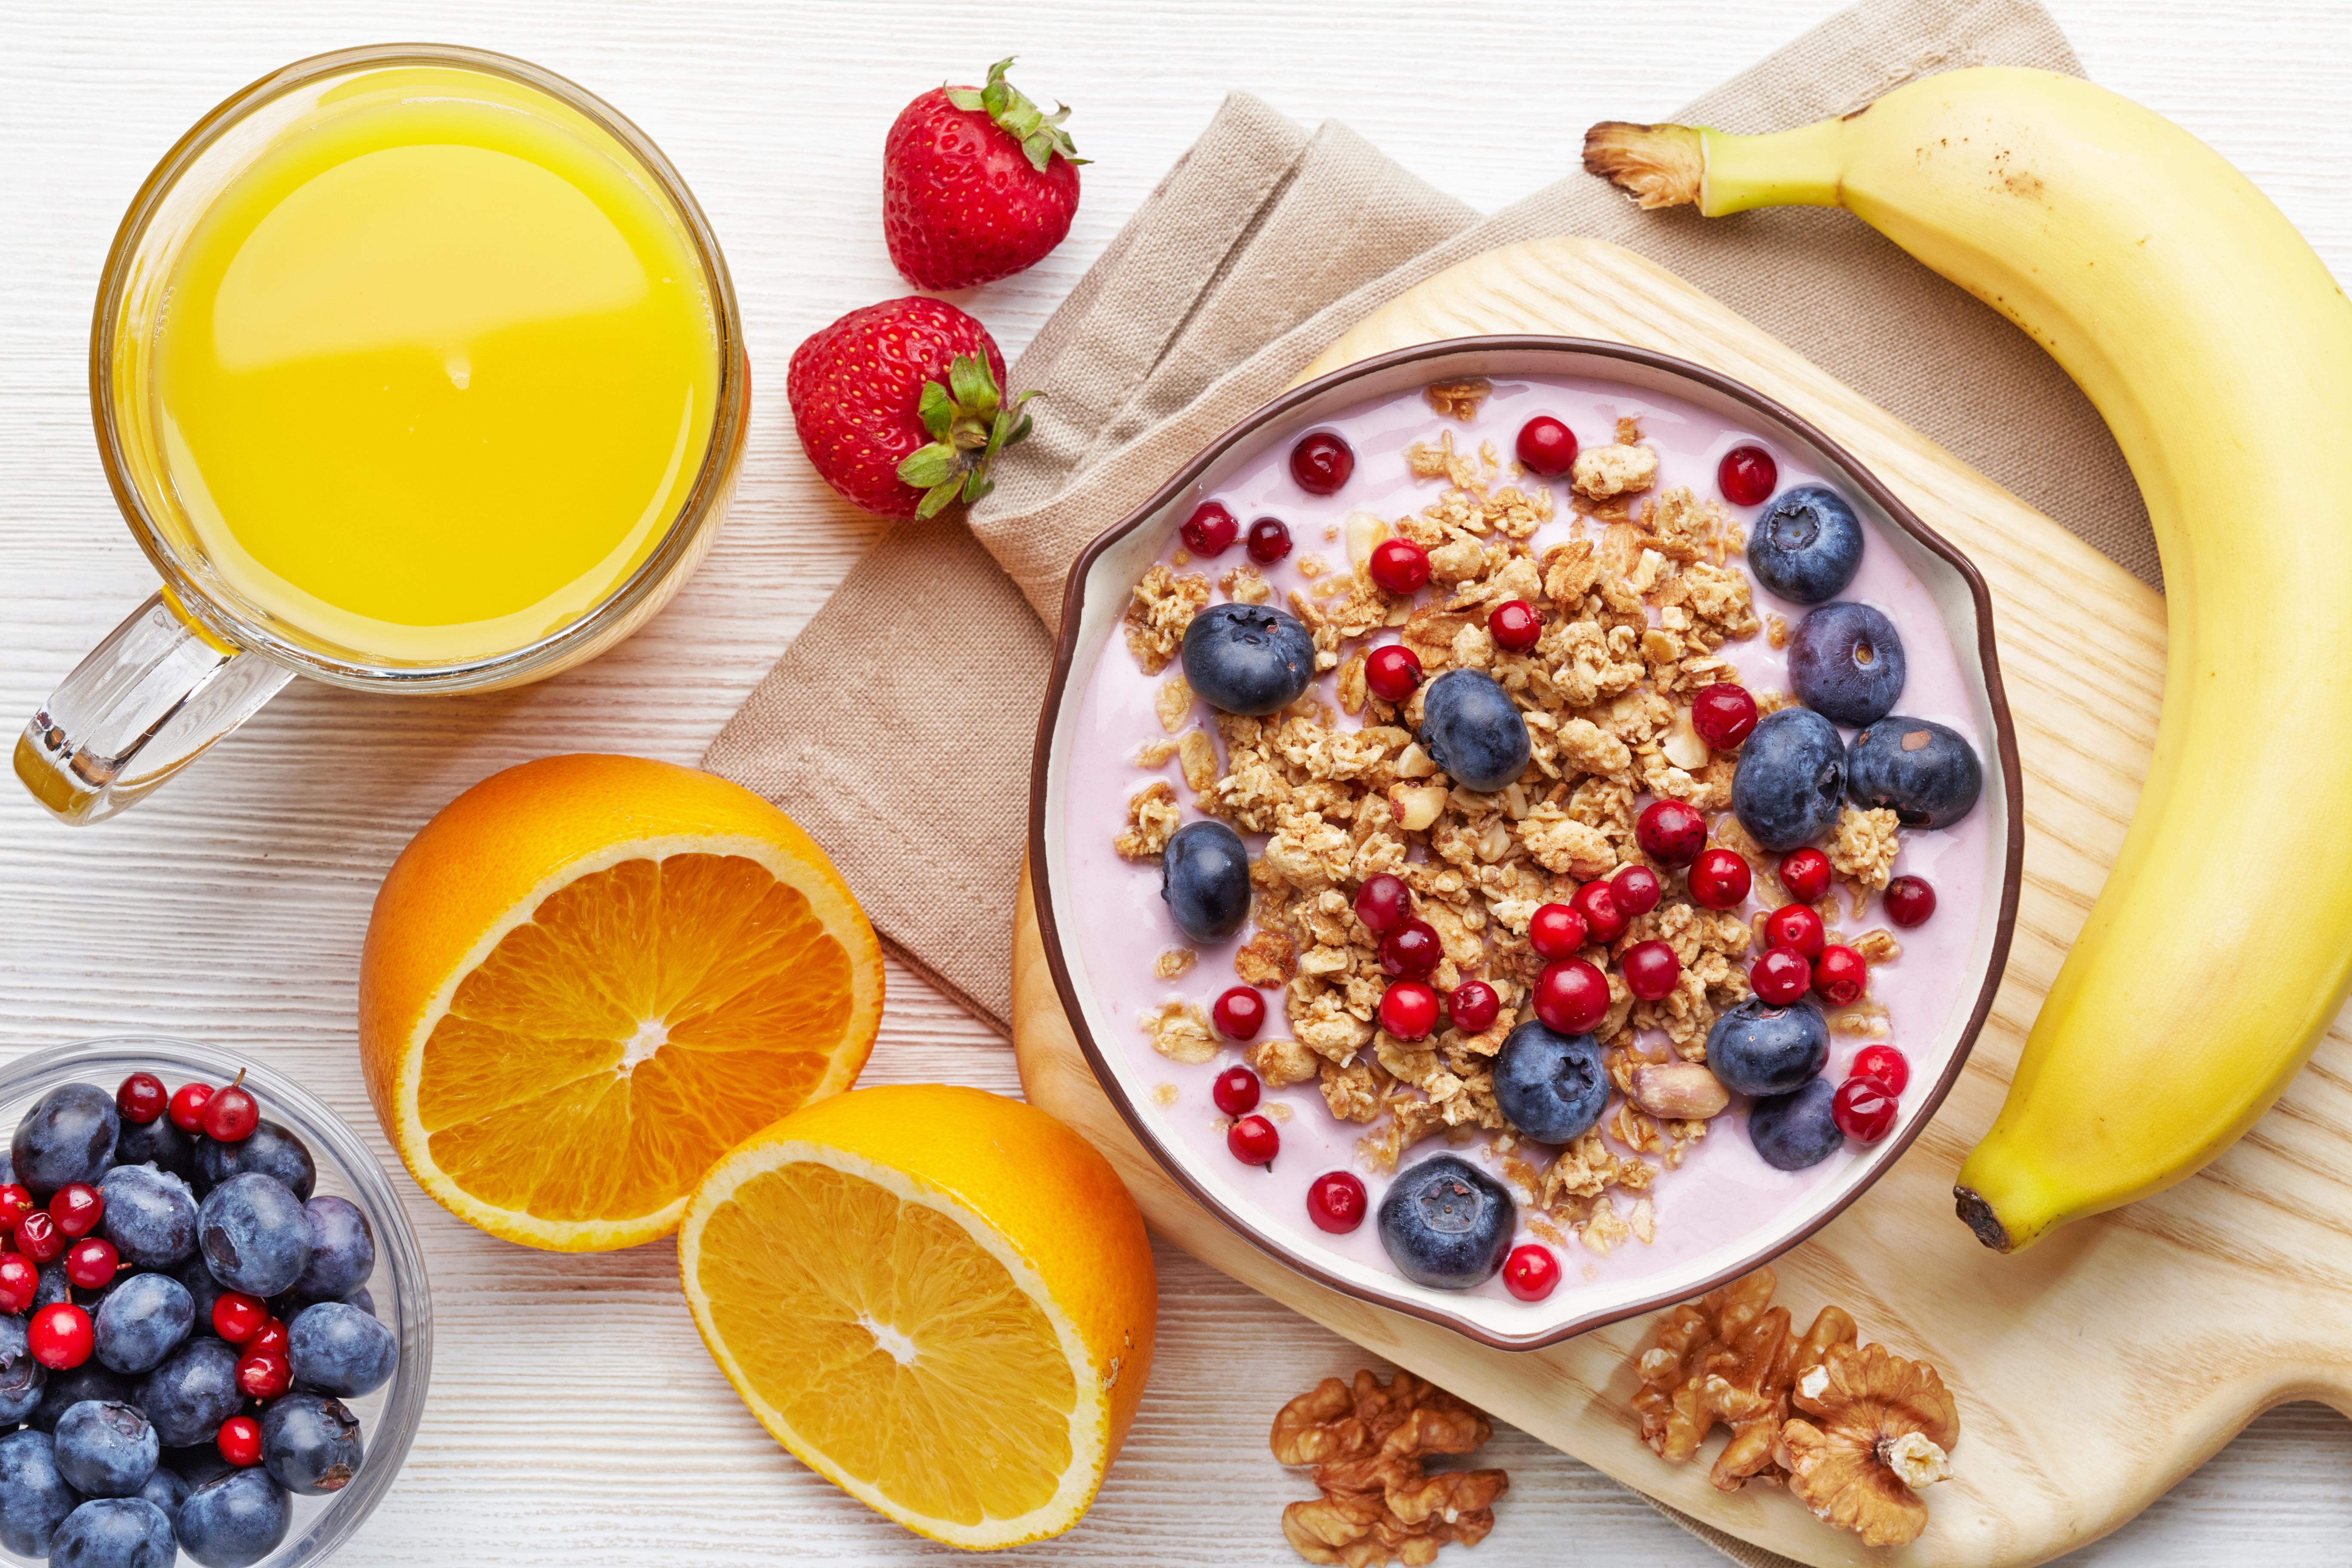 Breakfast wallpapers, Food, HQ Breakfast pictures 4K Wallpap